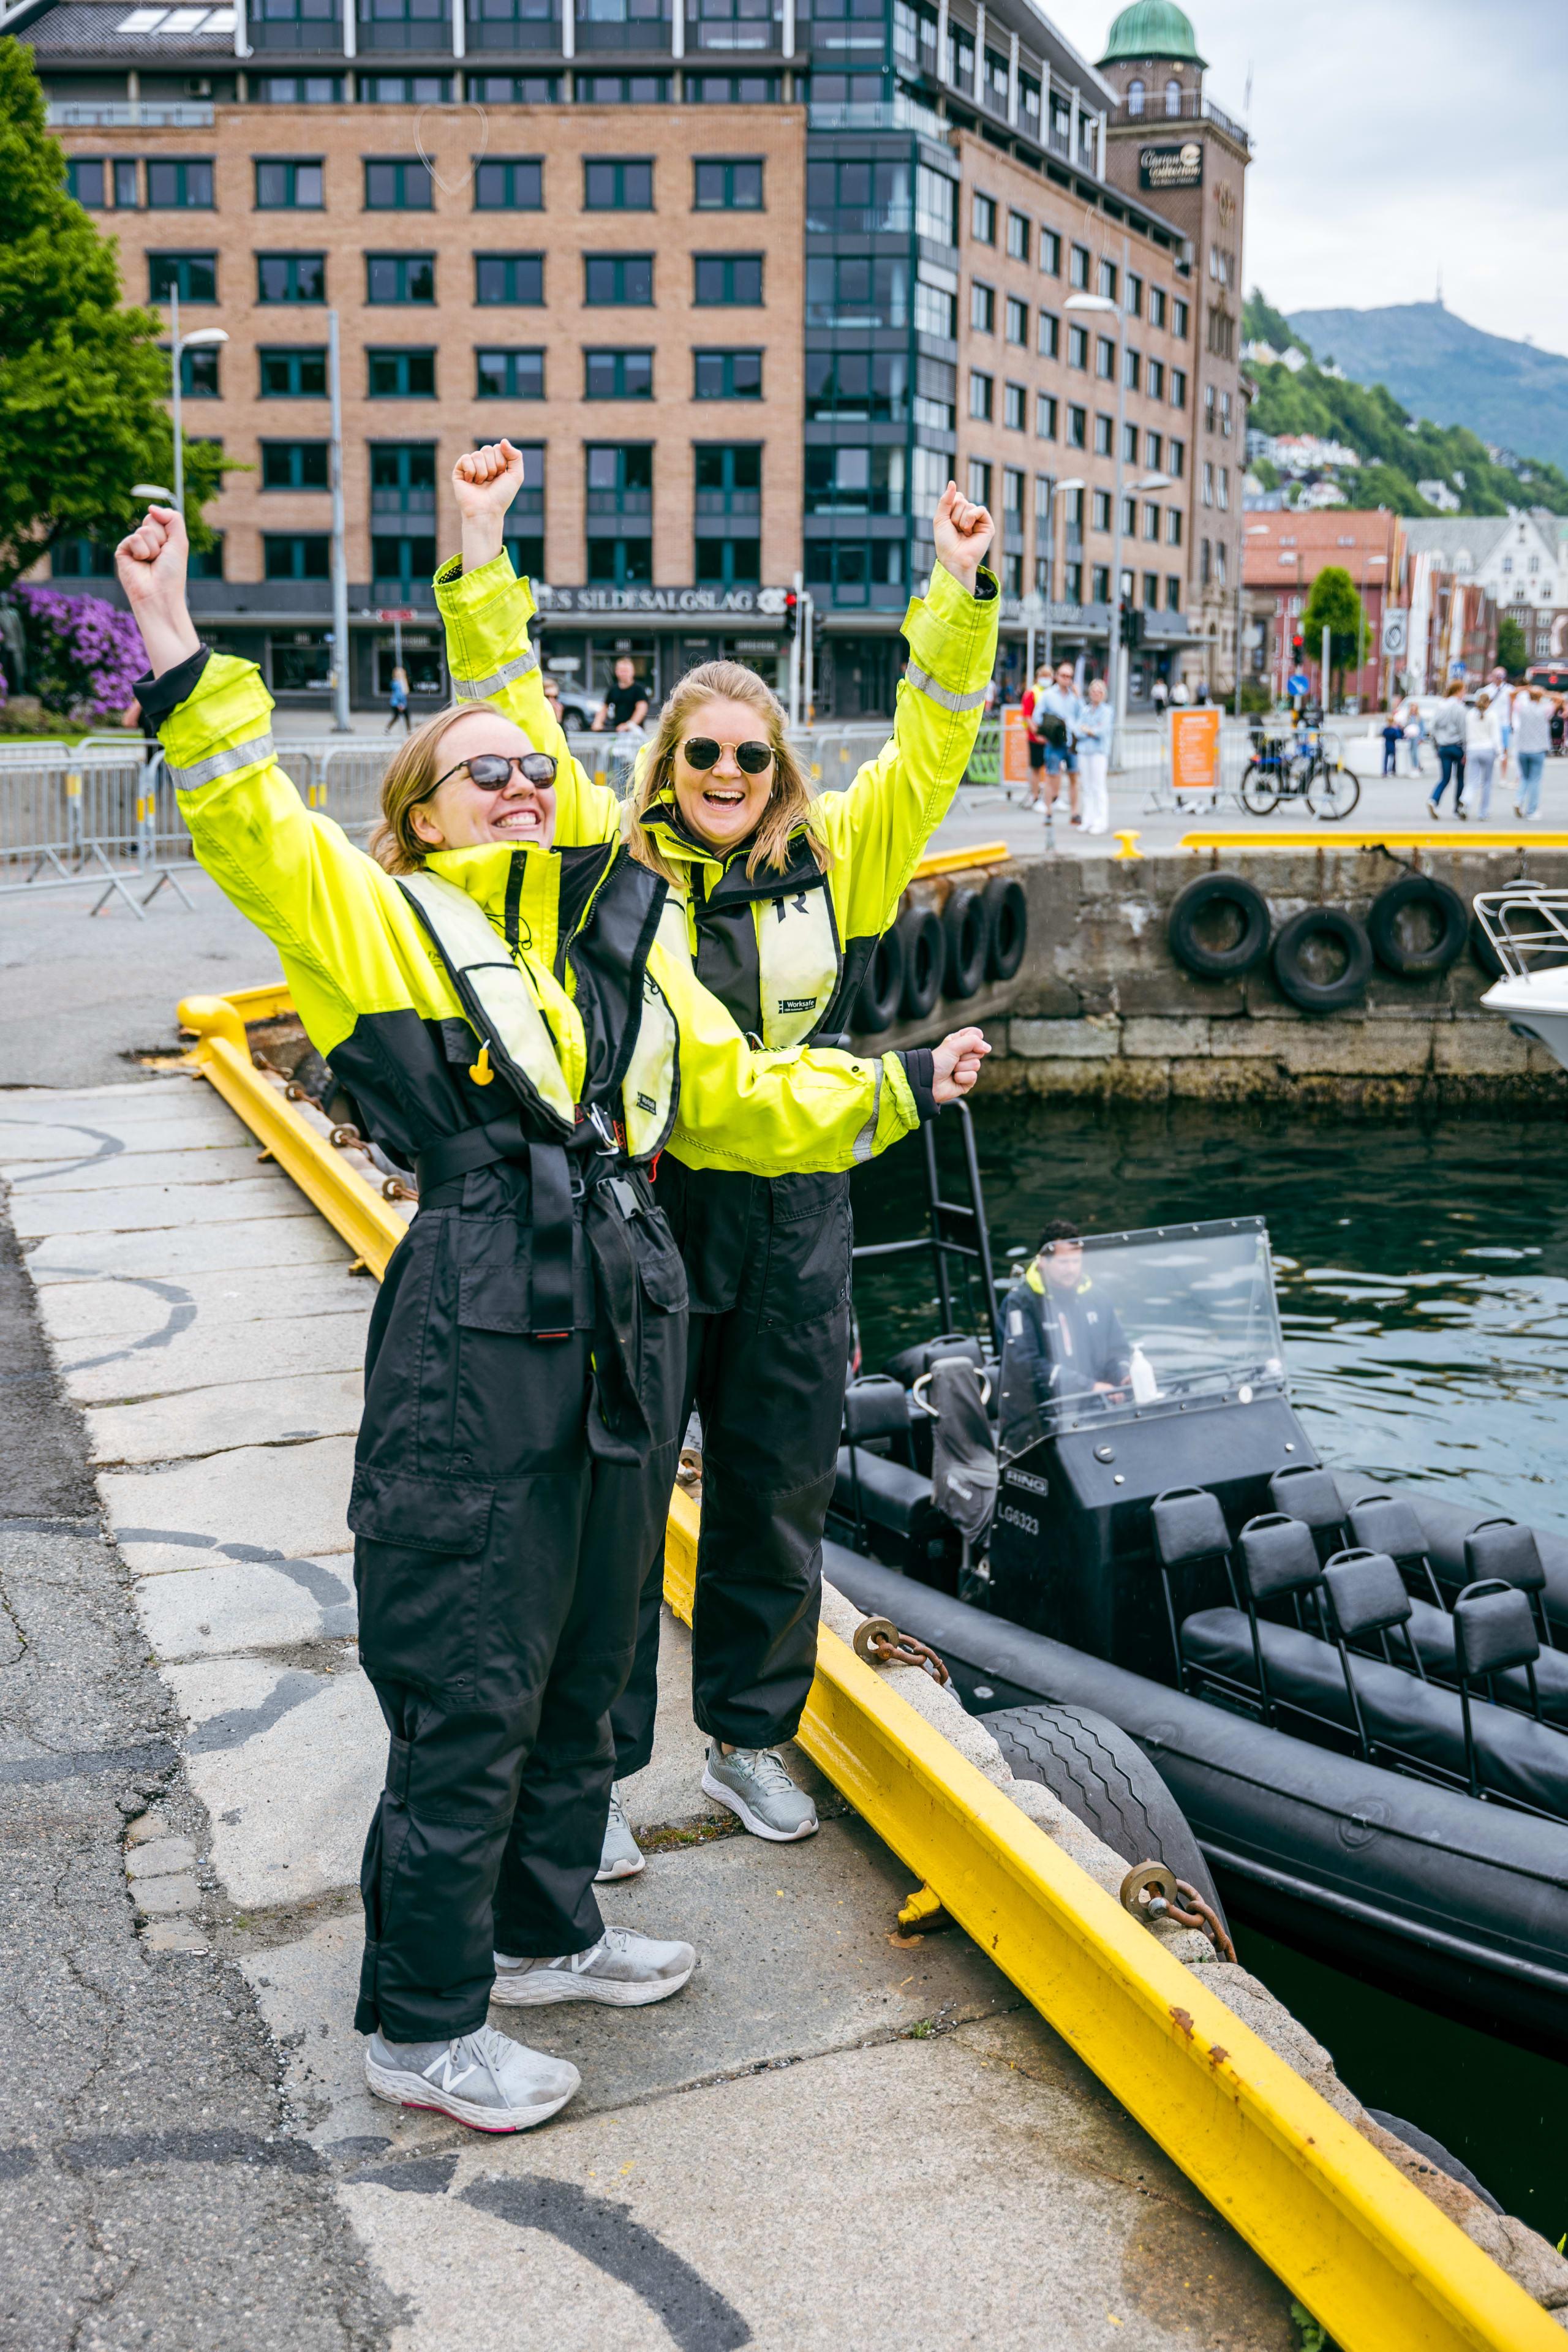 Cheering RIB ladies in Bergen harbor